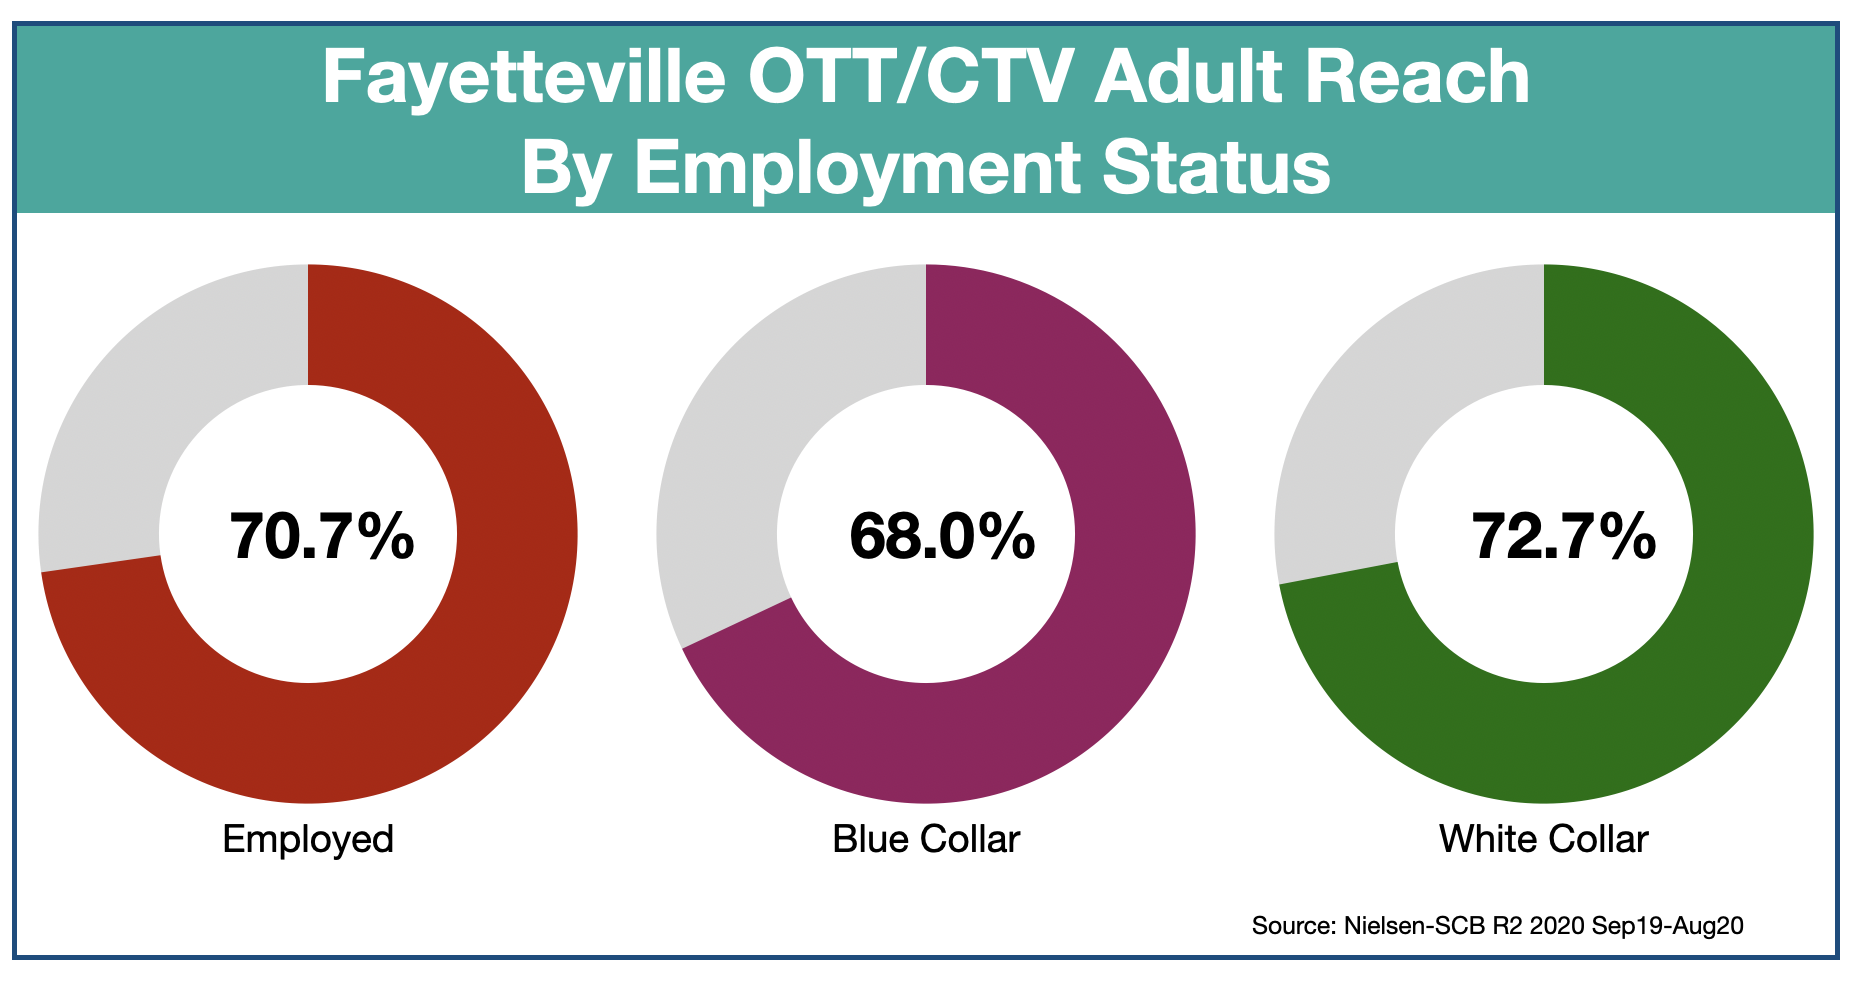 OTT & CTV advertising in Fayetteville, NC-Employment Status